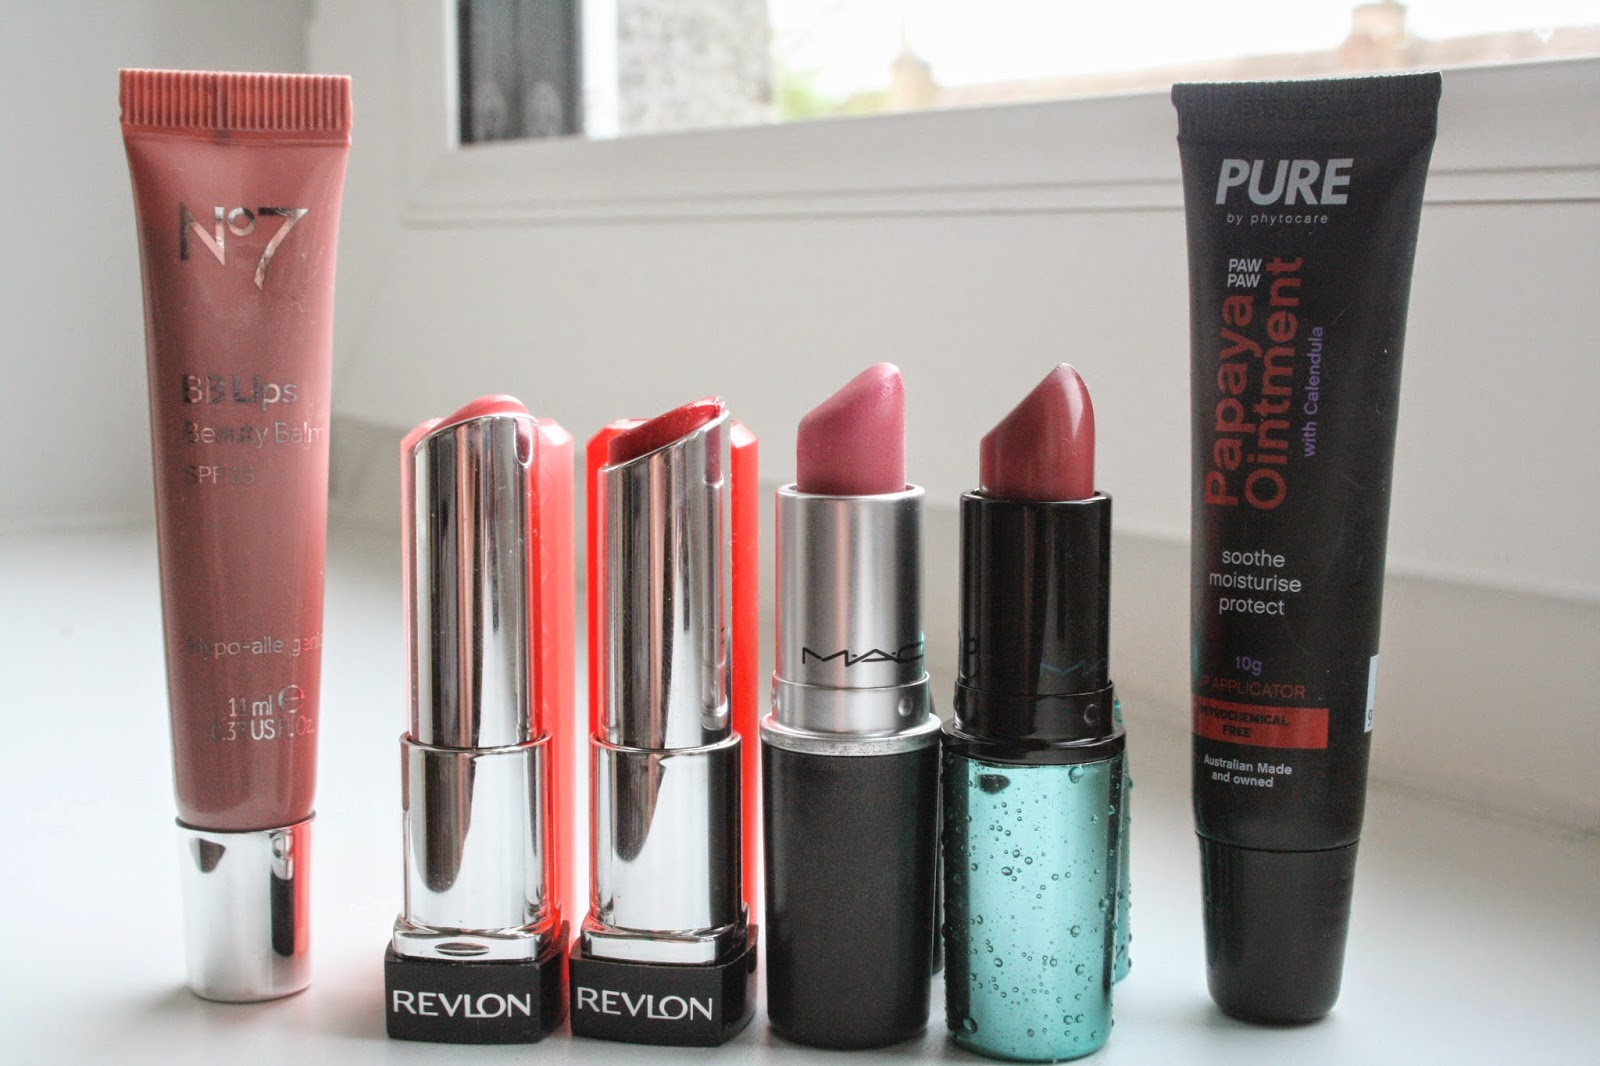 No7 BB lips in Ballerina, Revlon lip butters in Candy Apple & Pink Lemonade, MAC lovelorn, MAC mystical, Pure Papaya ointment